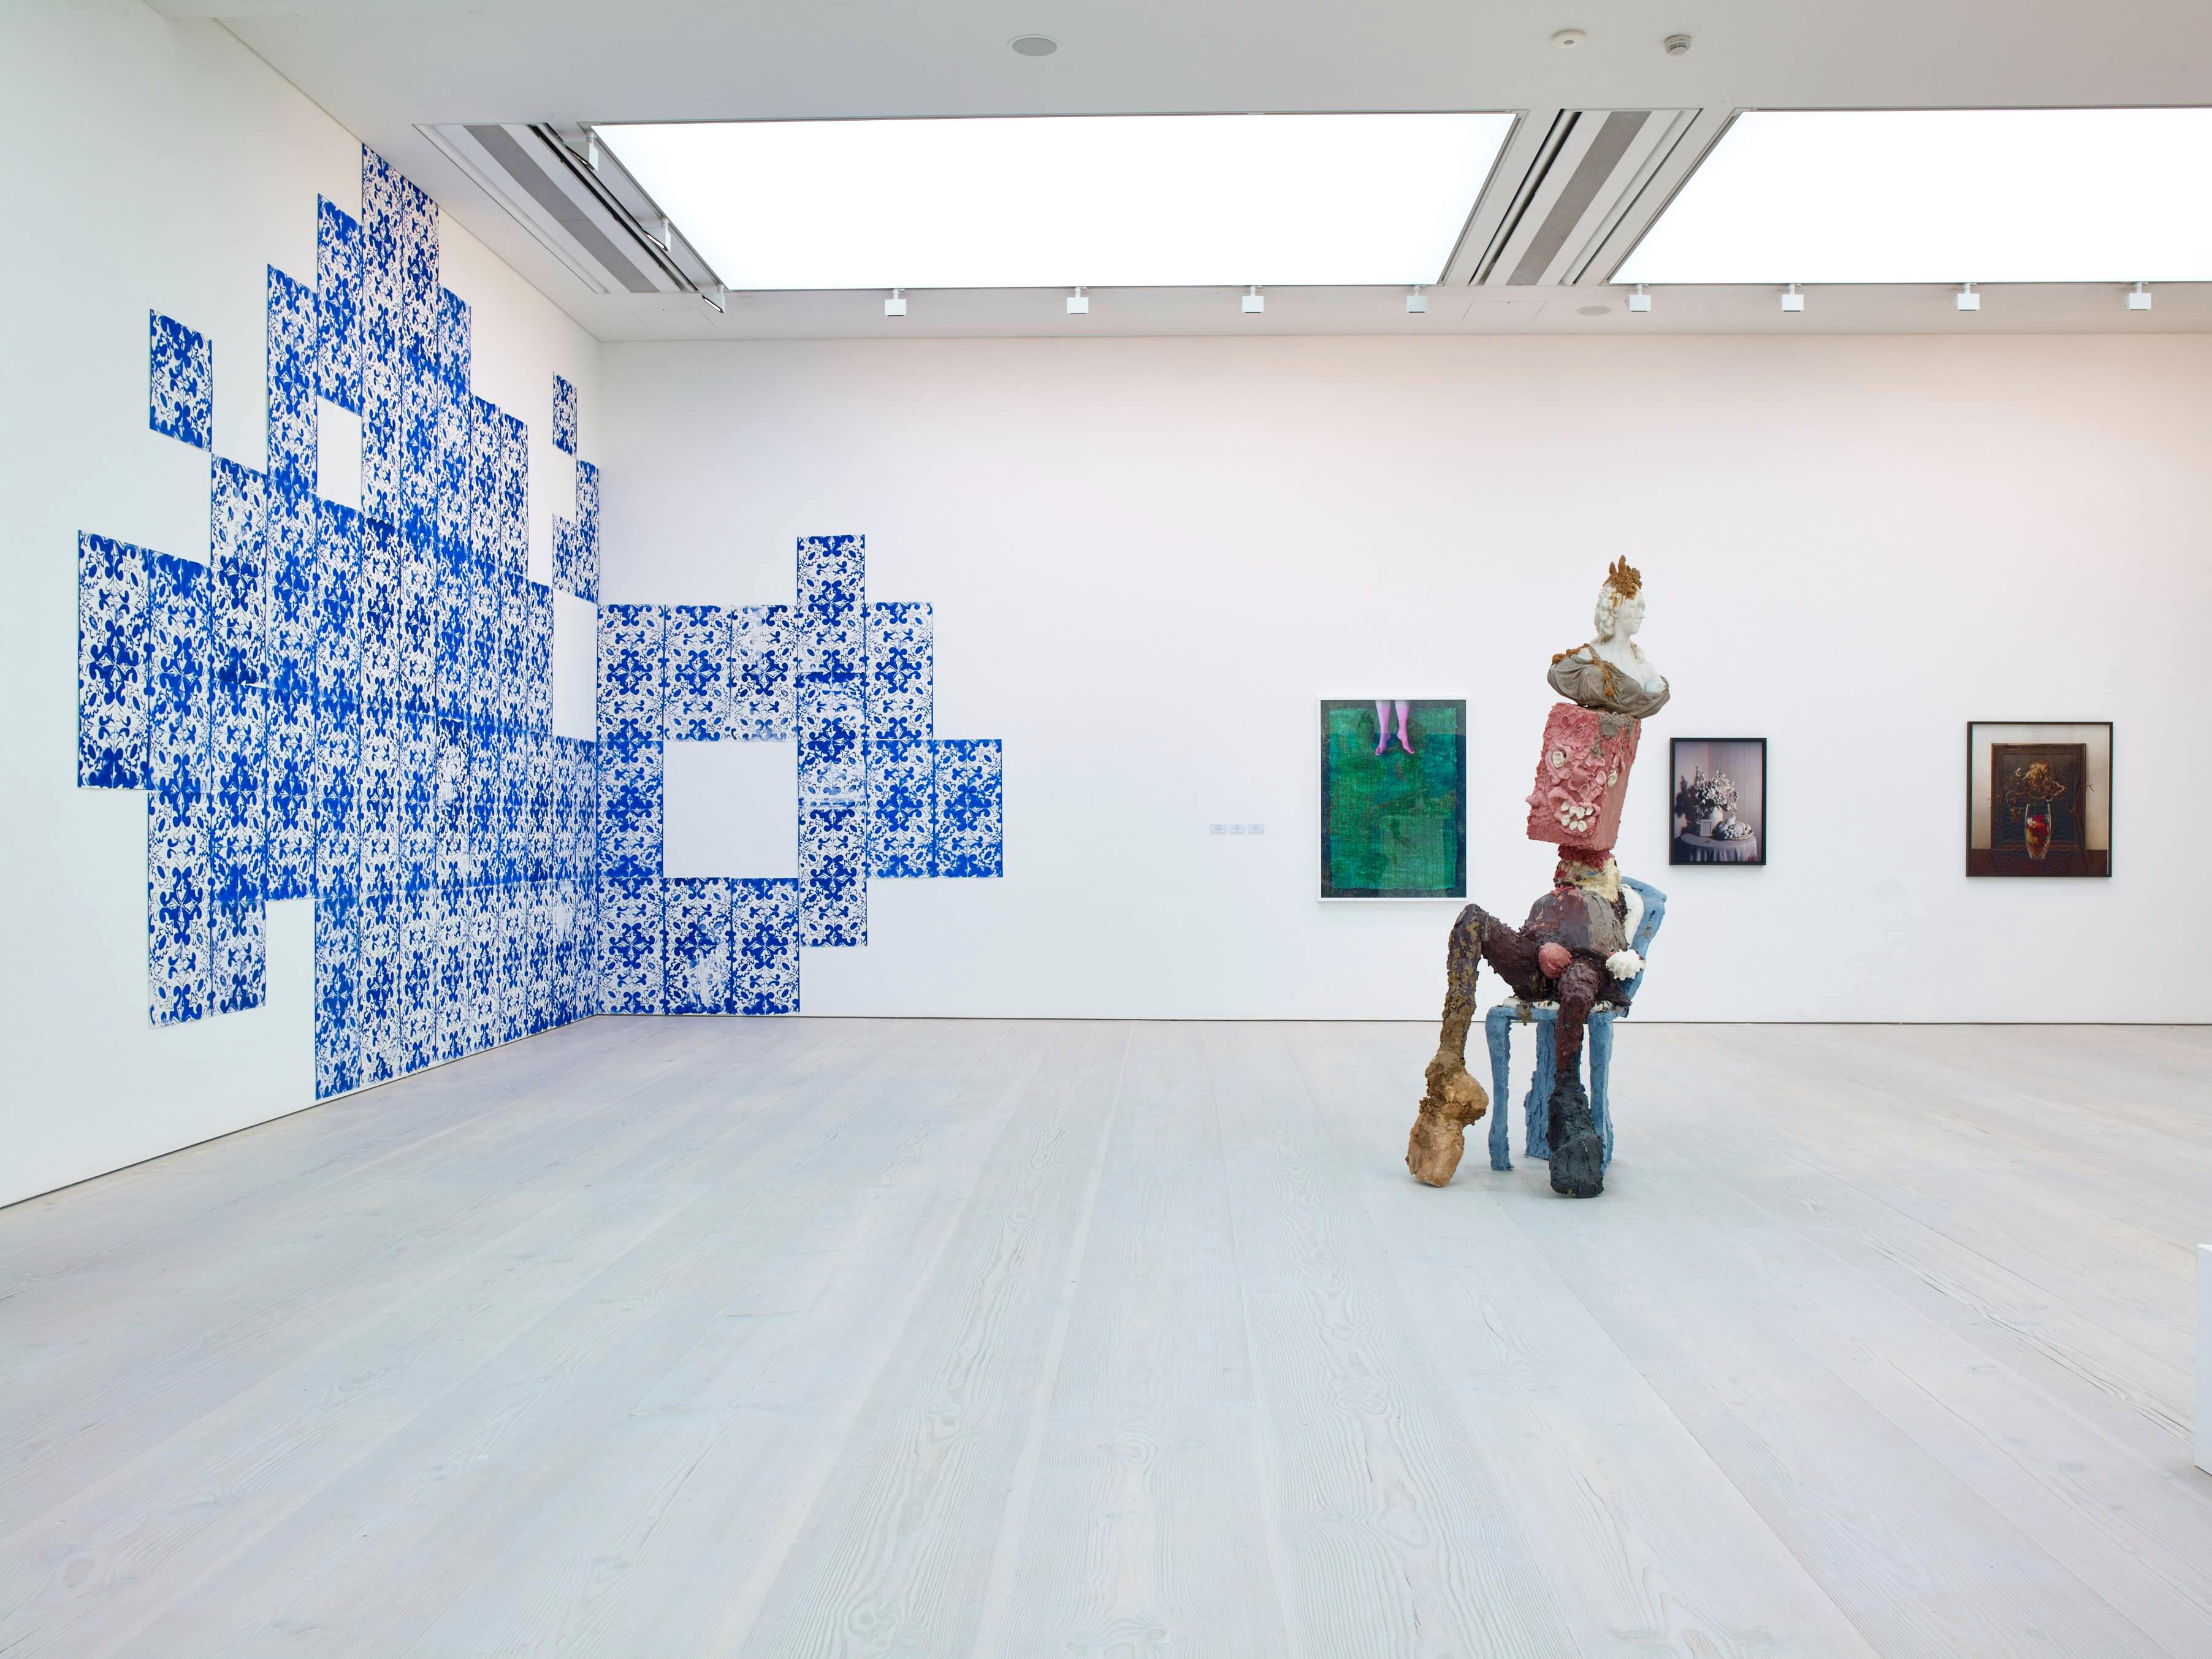 Artist Jamie Fitzpatrick install image